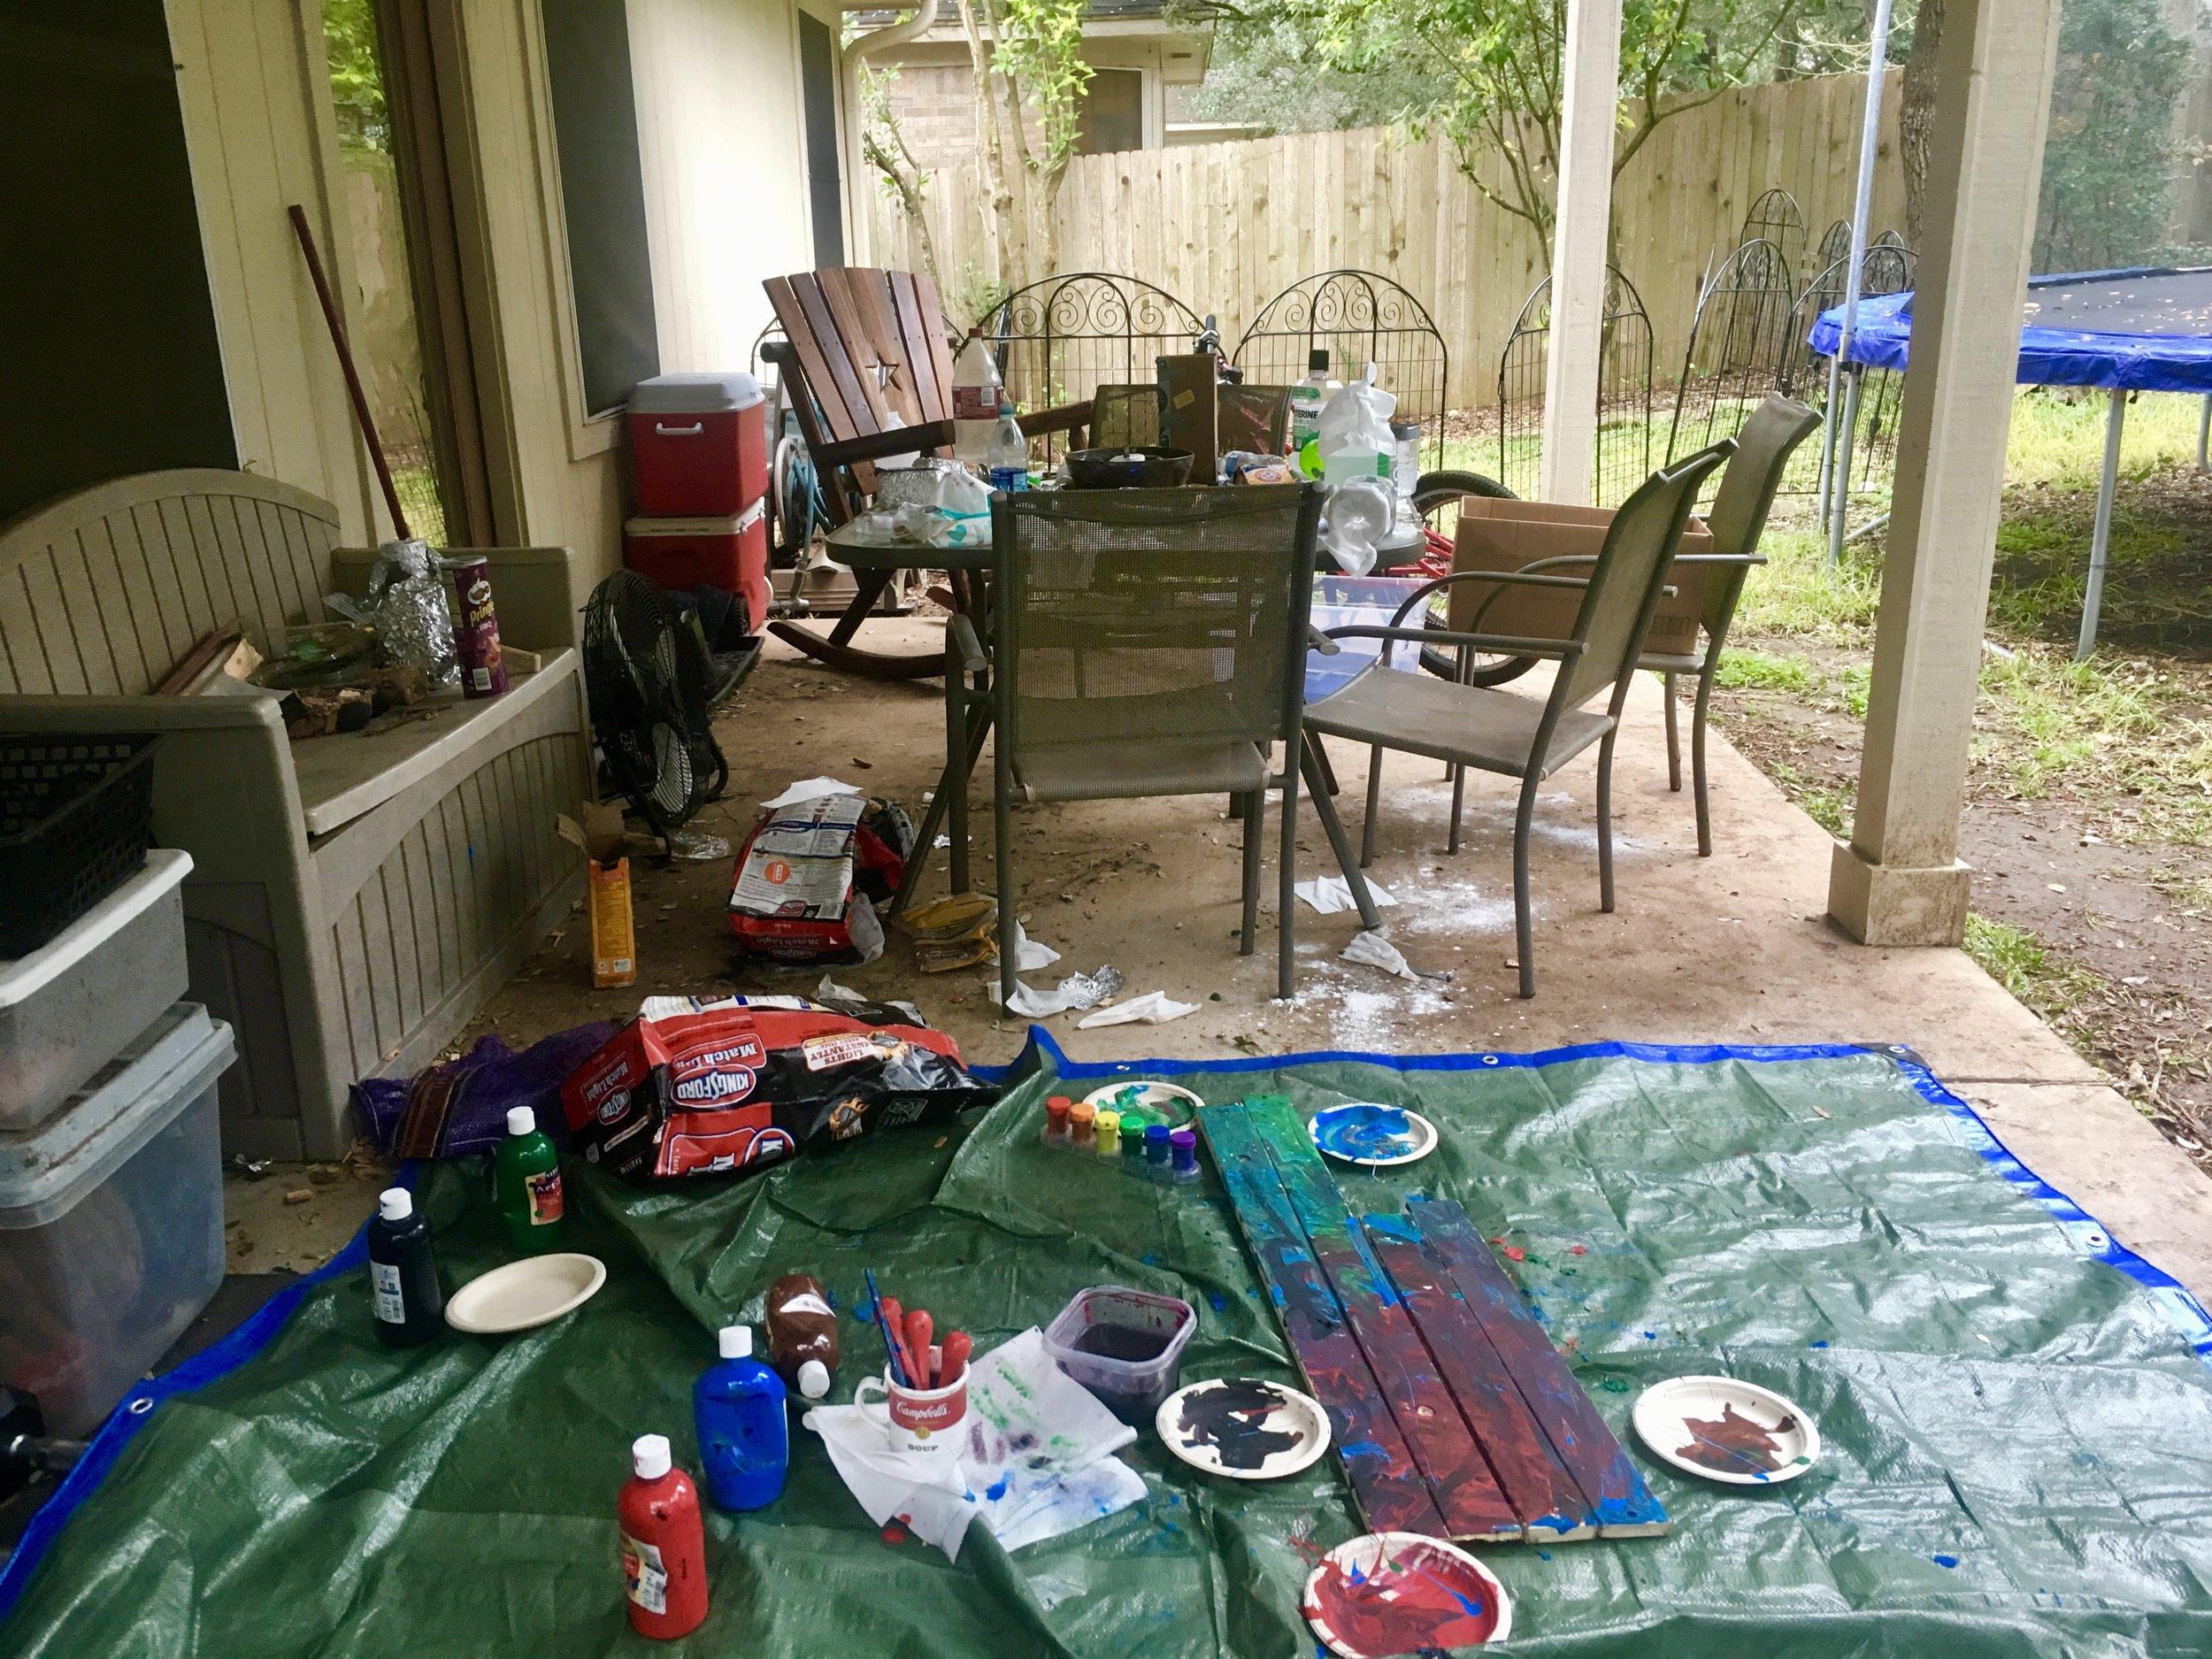 Backyard Chaos